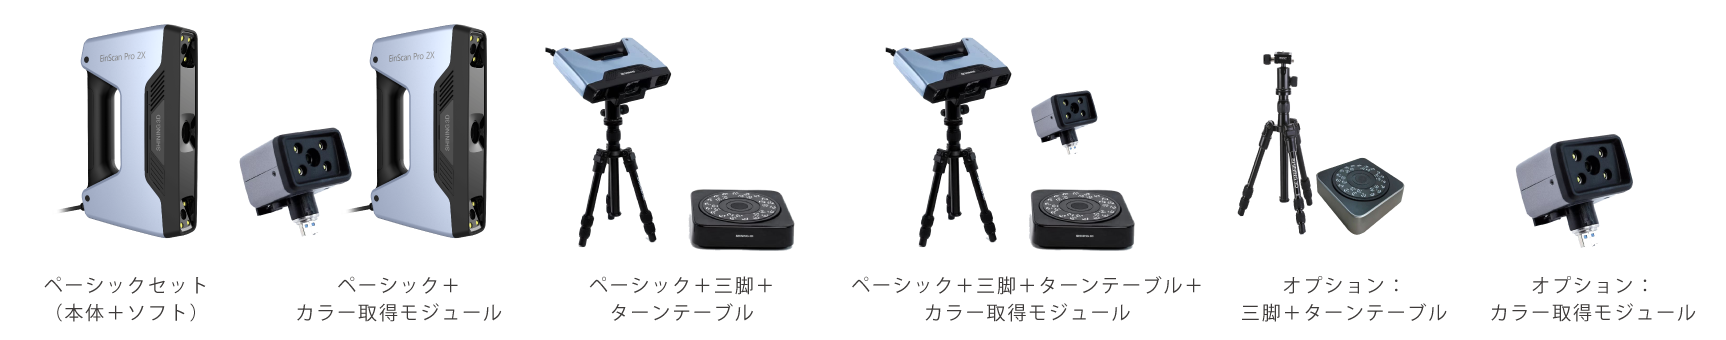 EinScan Pro 2X オプション